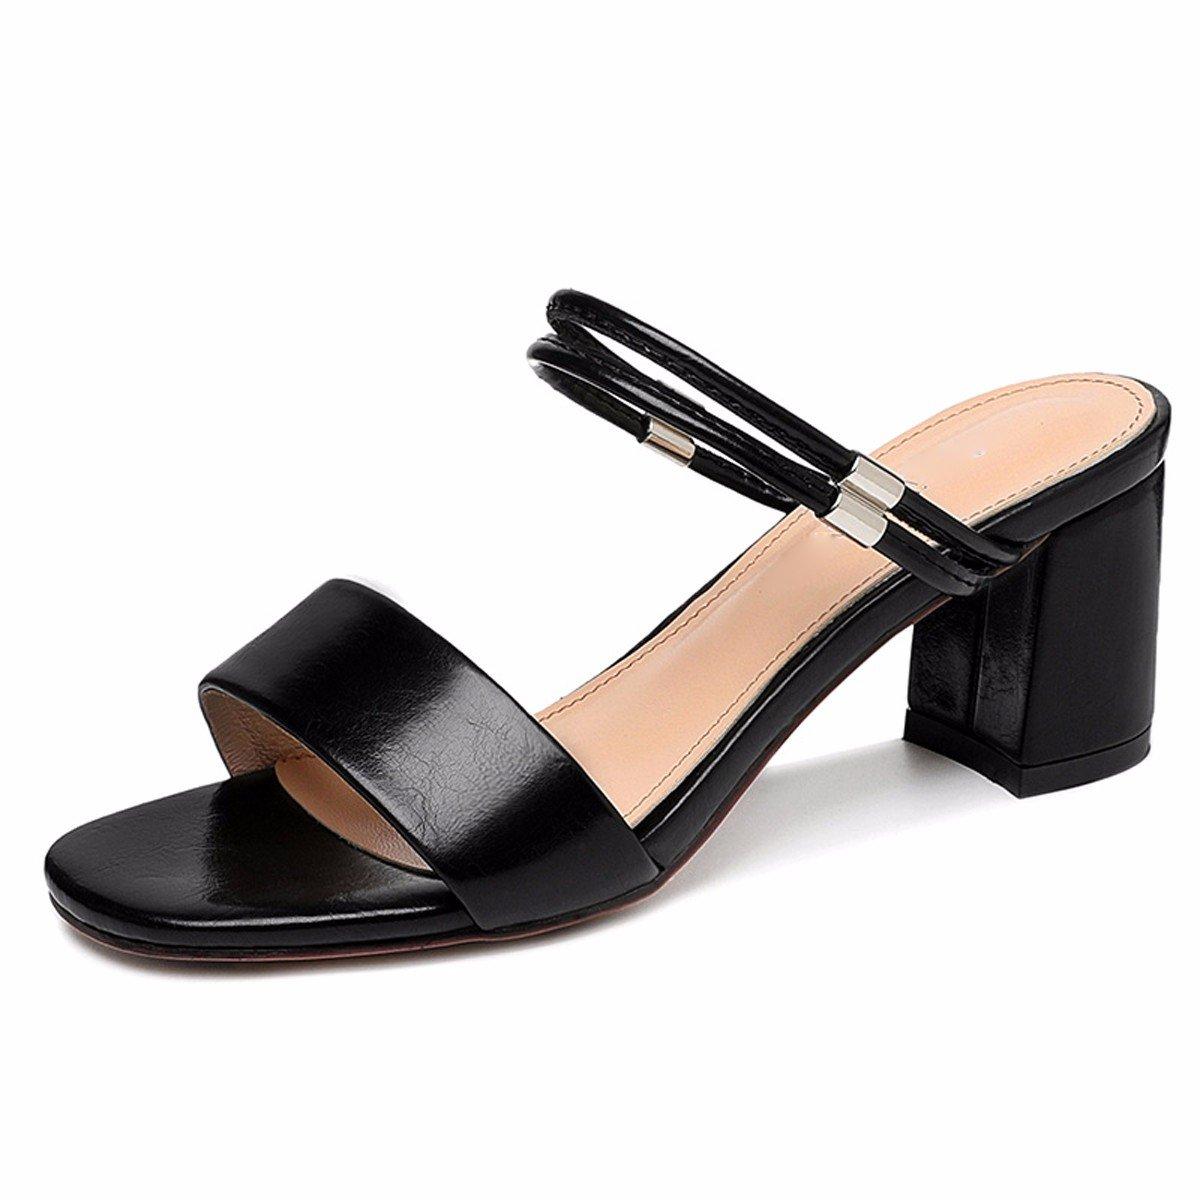 GTVERNH Mujer Zapatos/Un Par De Zapatos Dos Desgaste Sandalias Verano Rough Heels 7Cm Tacones Moda Desgaste Zapatos De Mujer.Treinta Y Ocho Blanco Thirty-eight|white